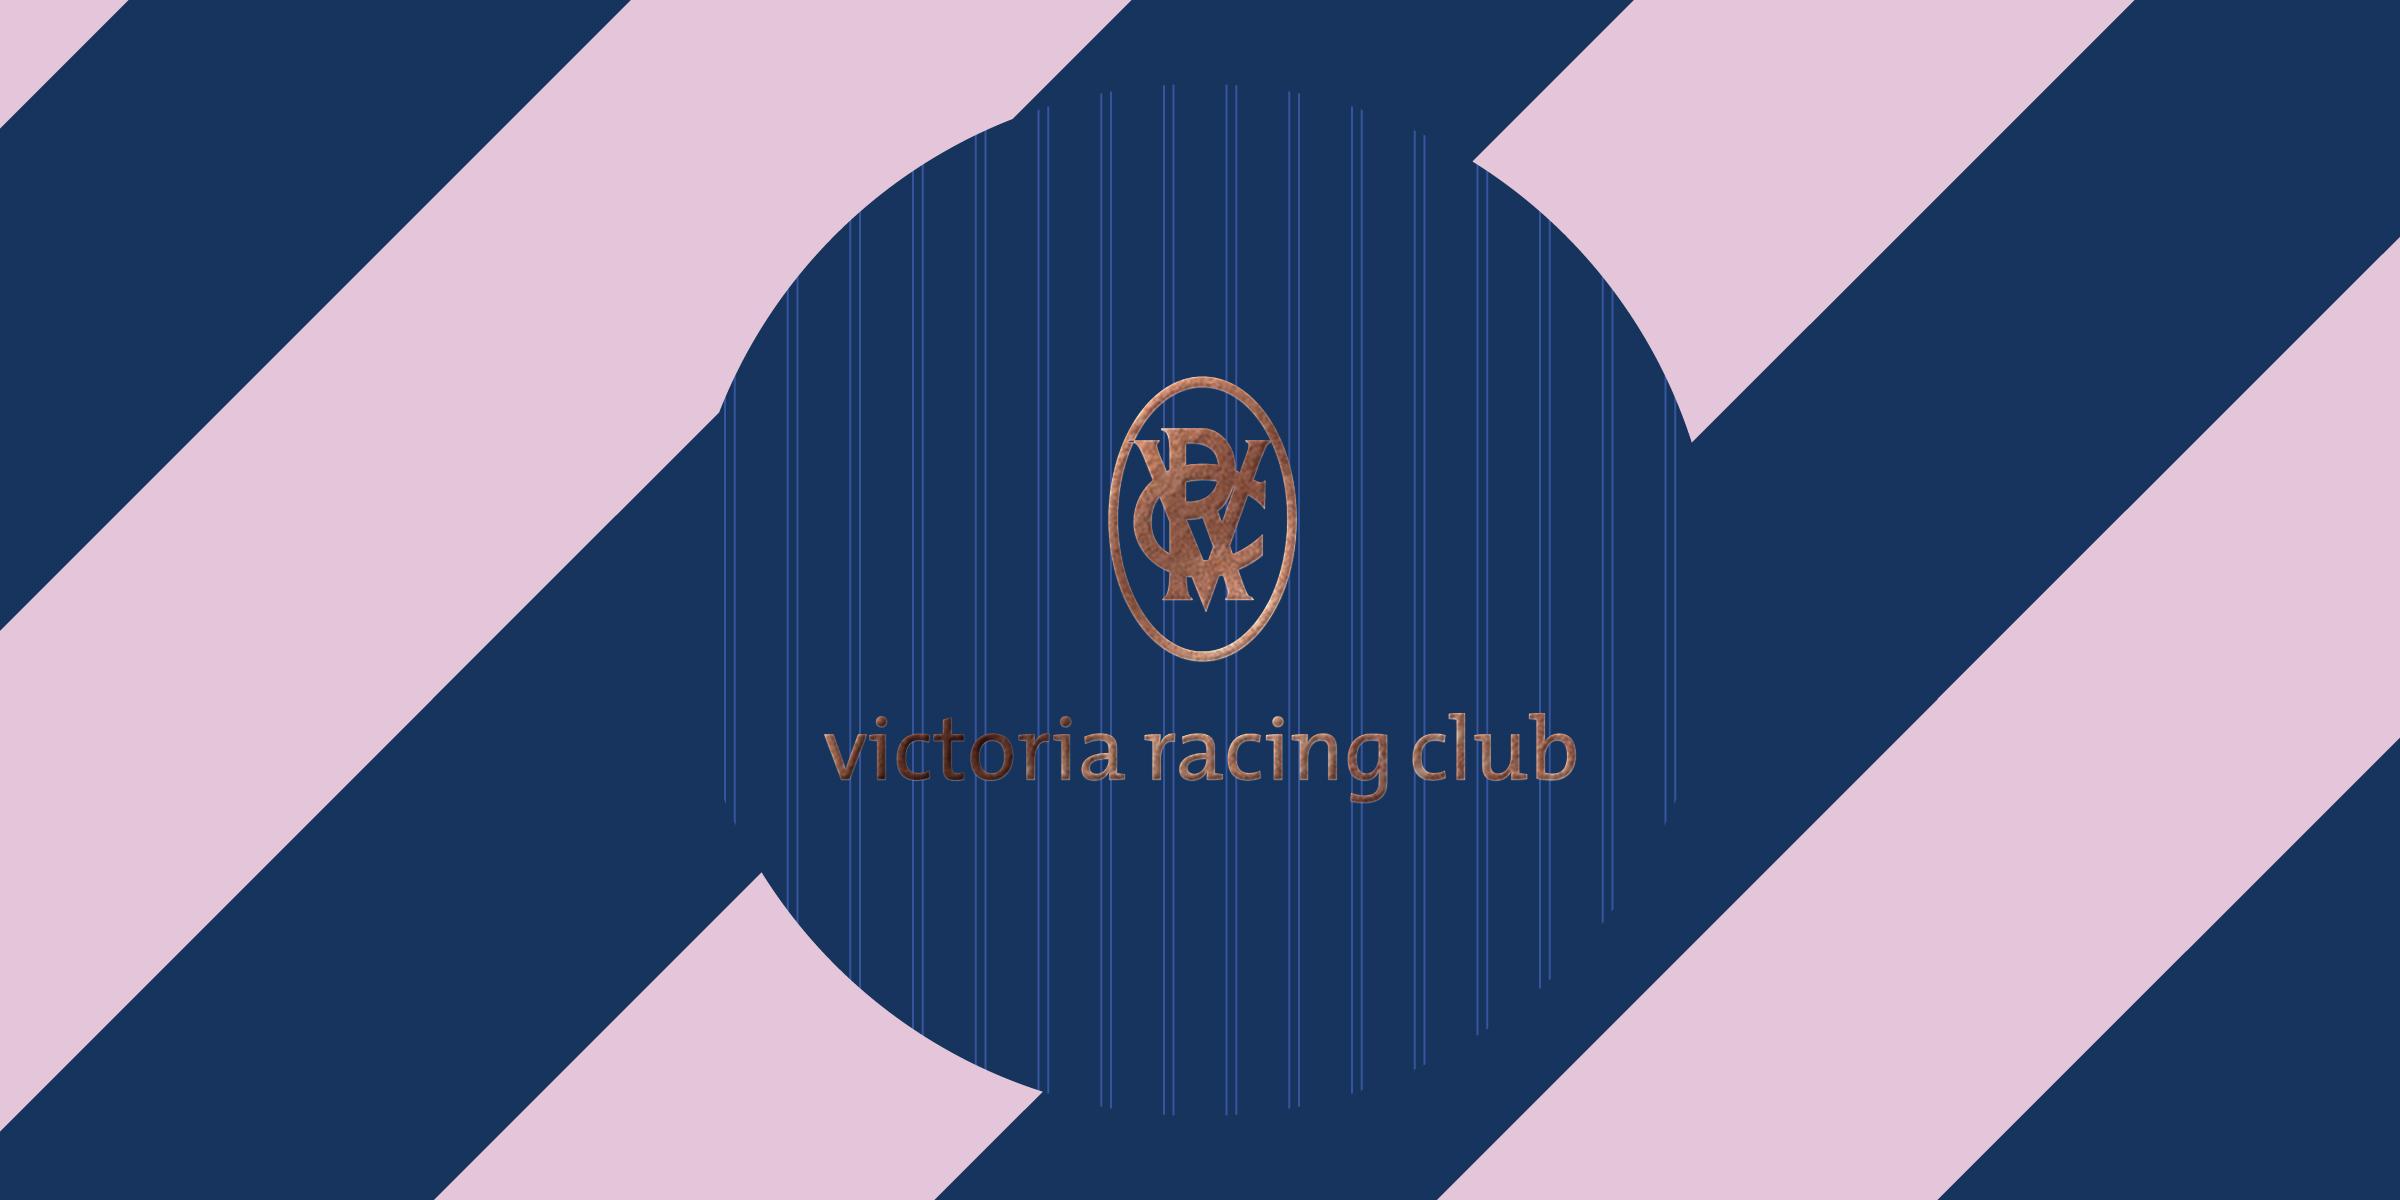 Victoria Racing Club Brand Identity